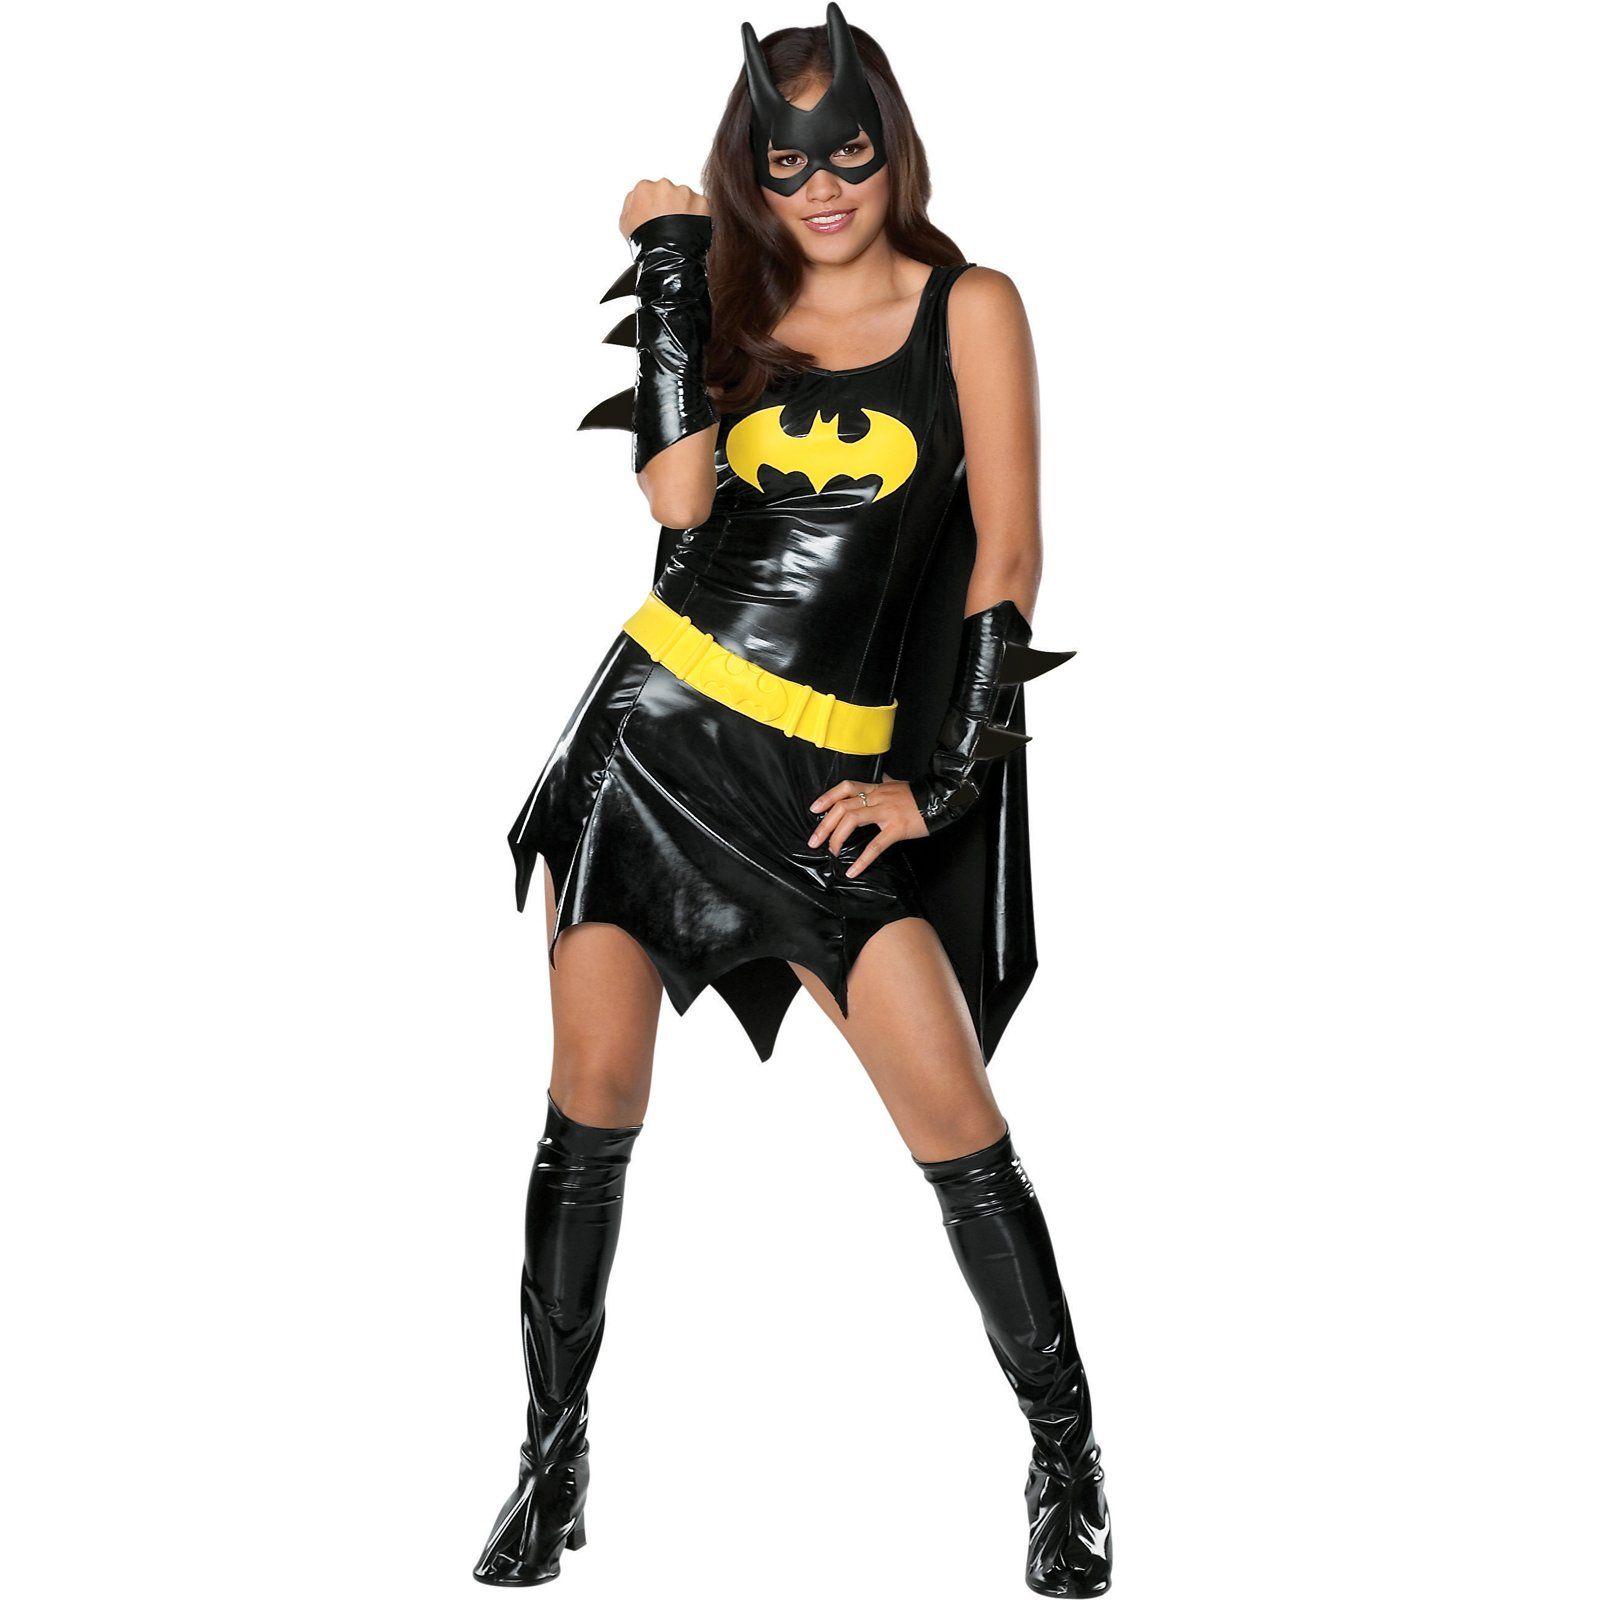 DC Comics Batgirl Teen Costume | Google images, Teen costumes and ...